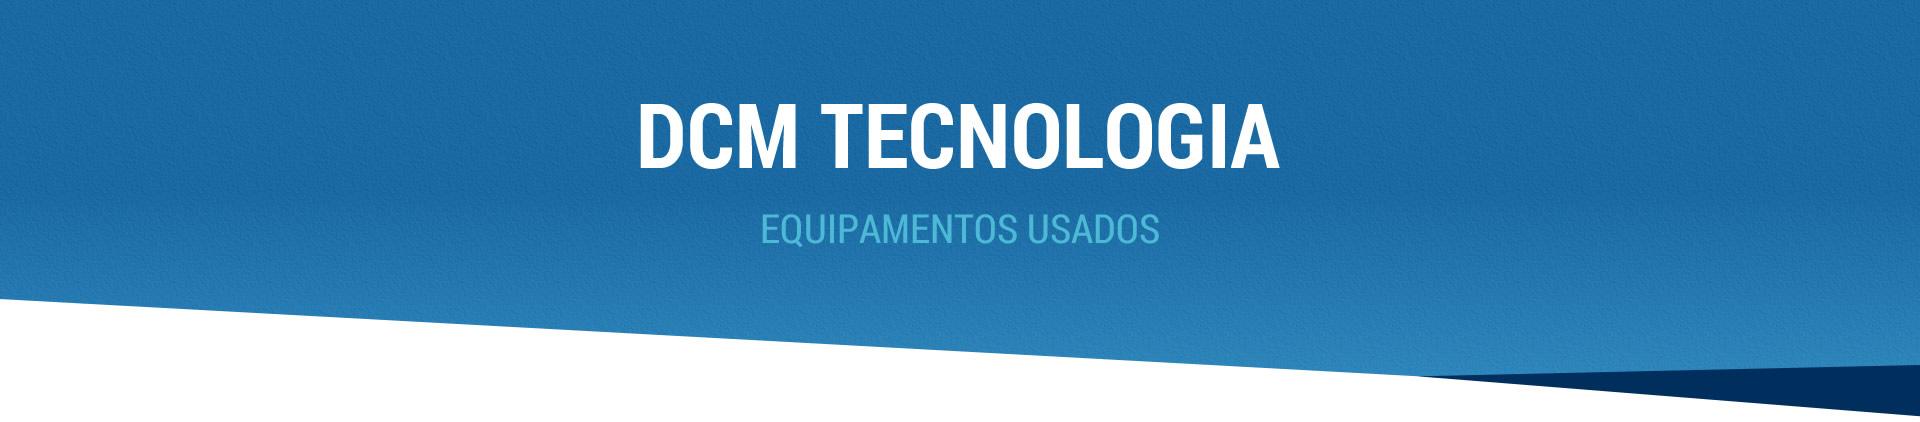 DCM Tecnologia